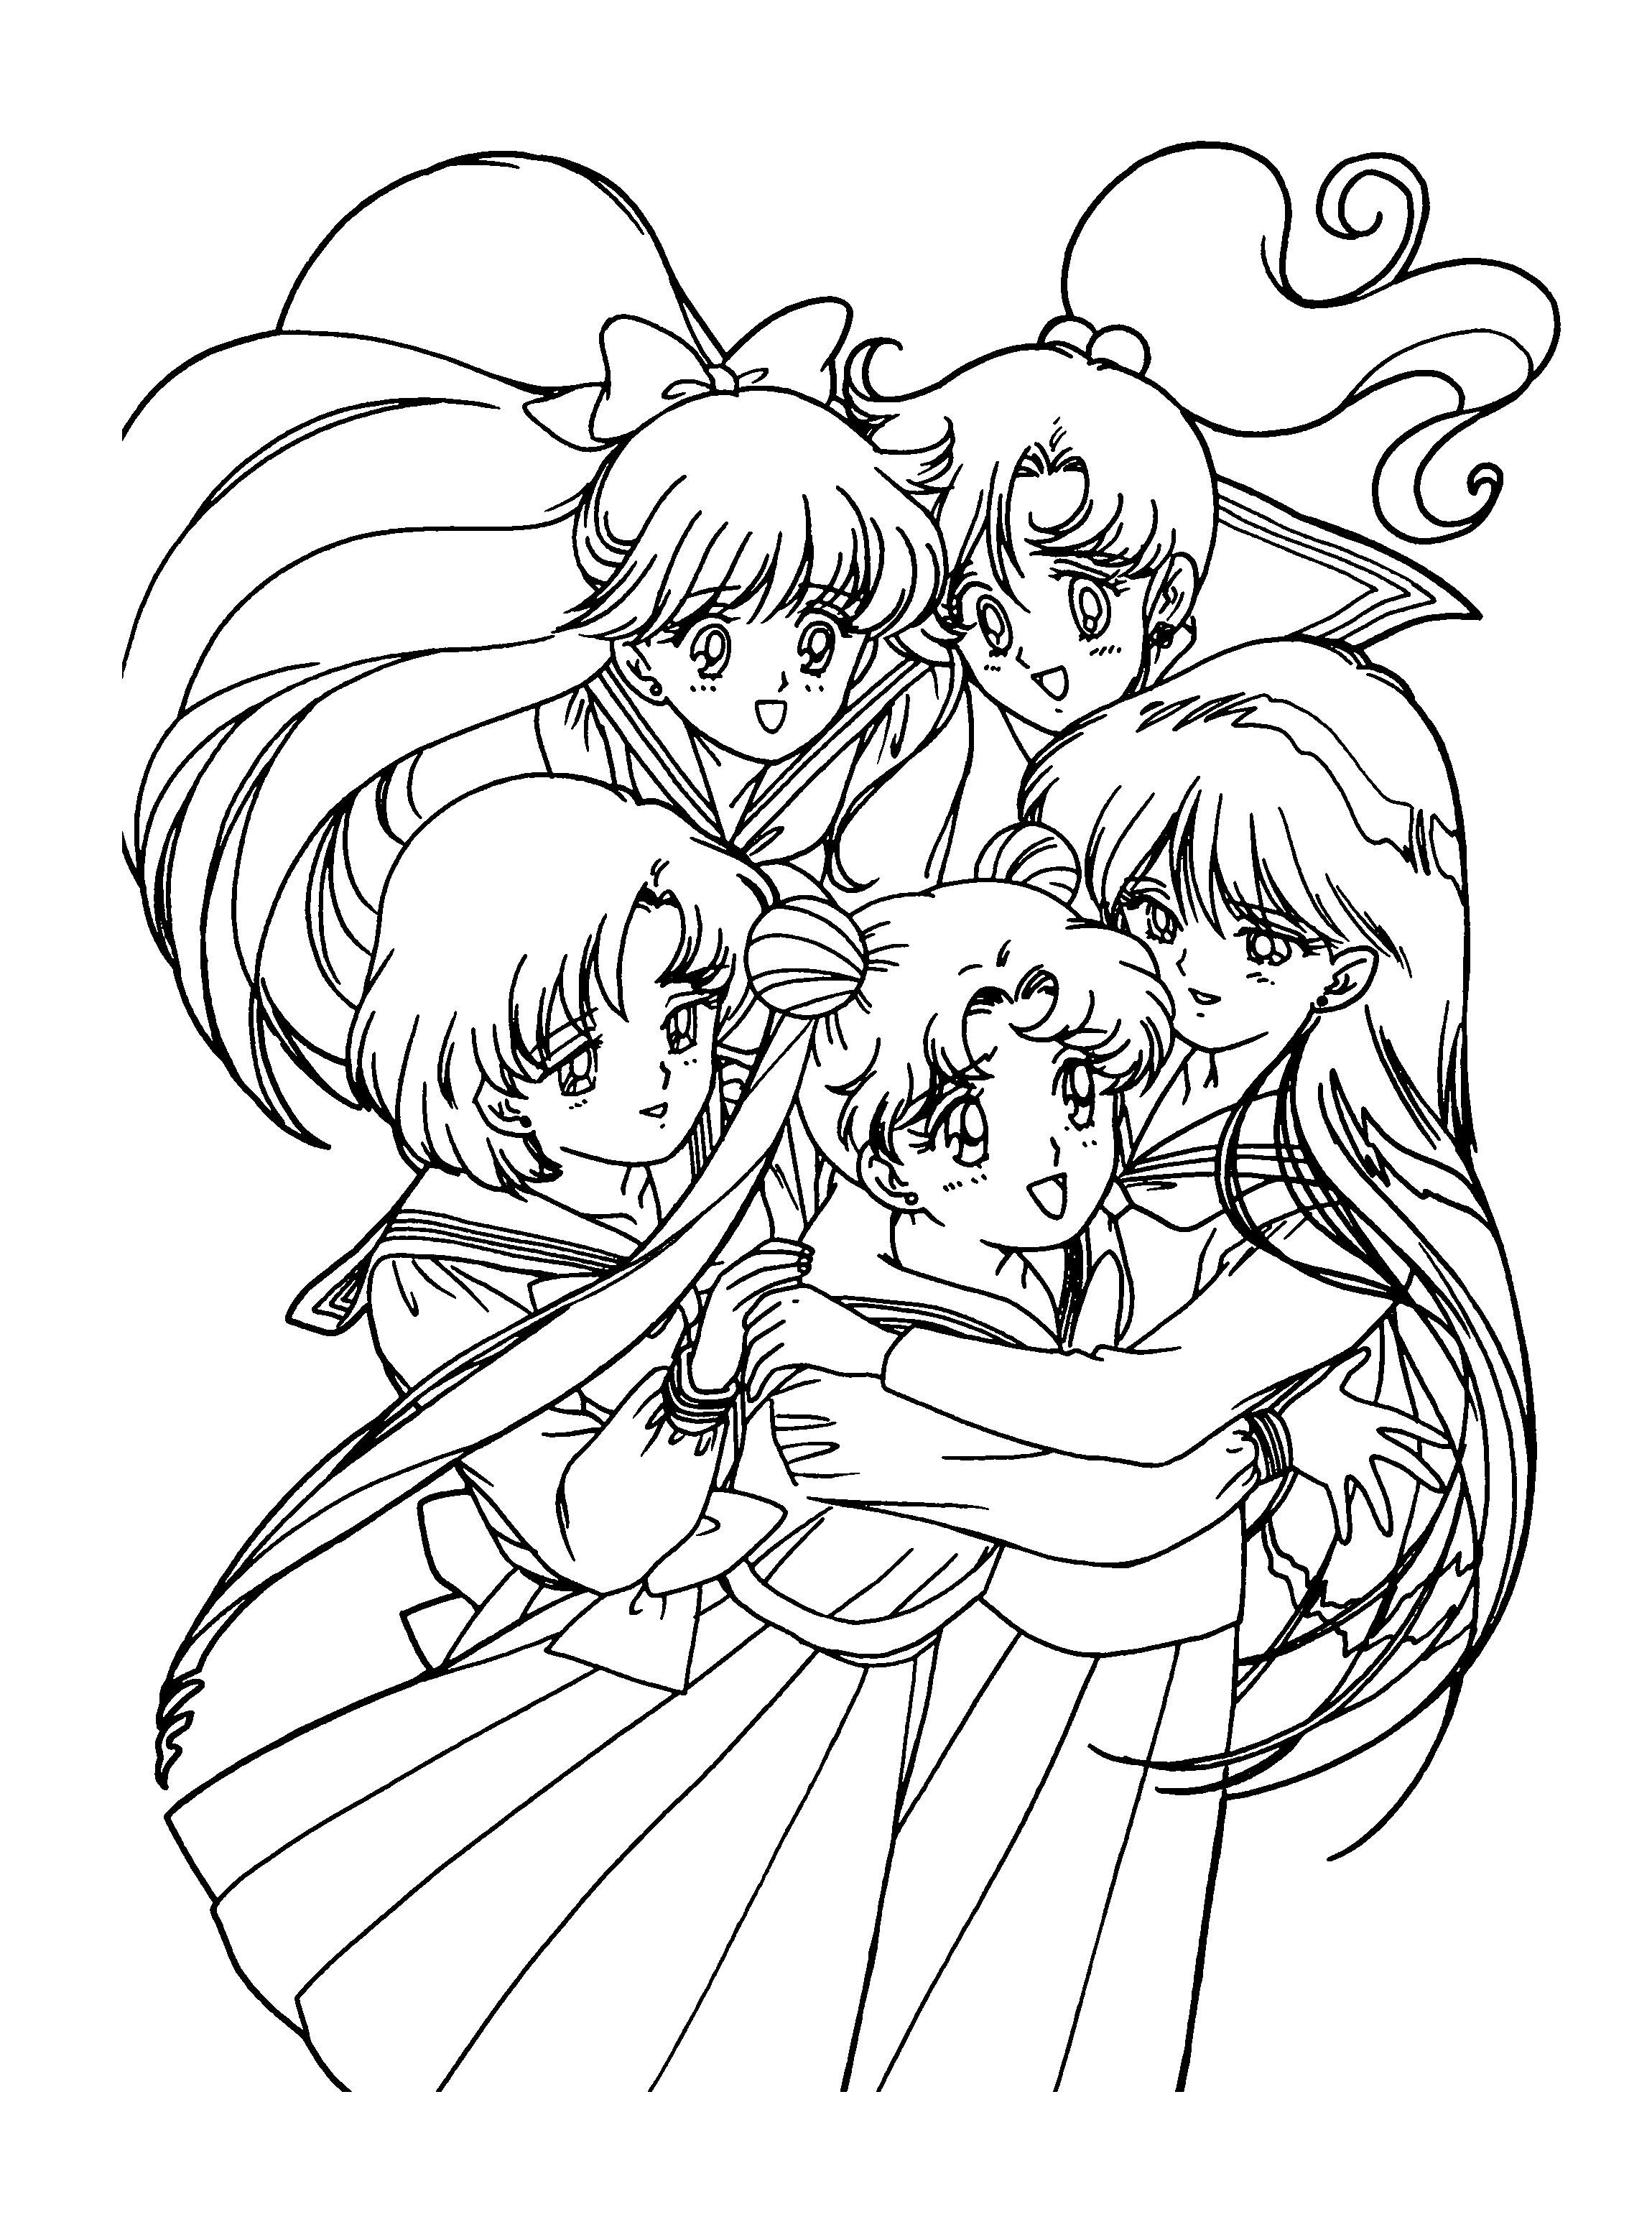 Anime Ausmalbilder Chibi Neu 40 Www Ausmalbilder Scoredatscore Frisch Ausmalbilder Anime Girl Fotos